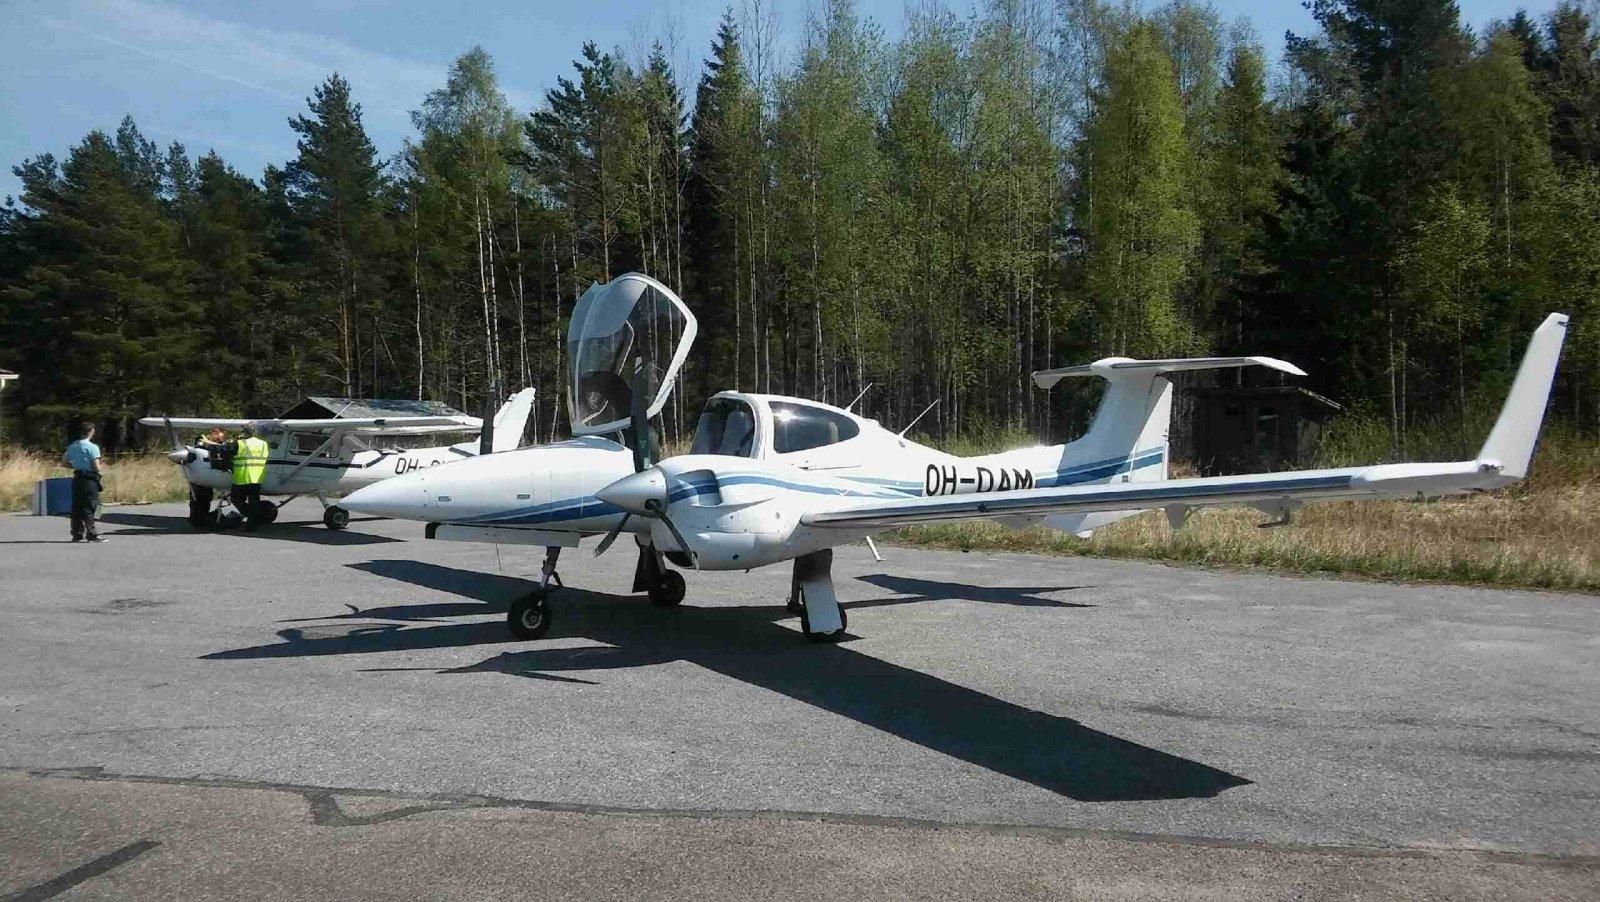 Diamond DA 42-VI OH-DAM & Reims/Cessna FA152 Aerobat OH-CKC EFHN 2018-05-14